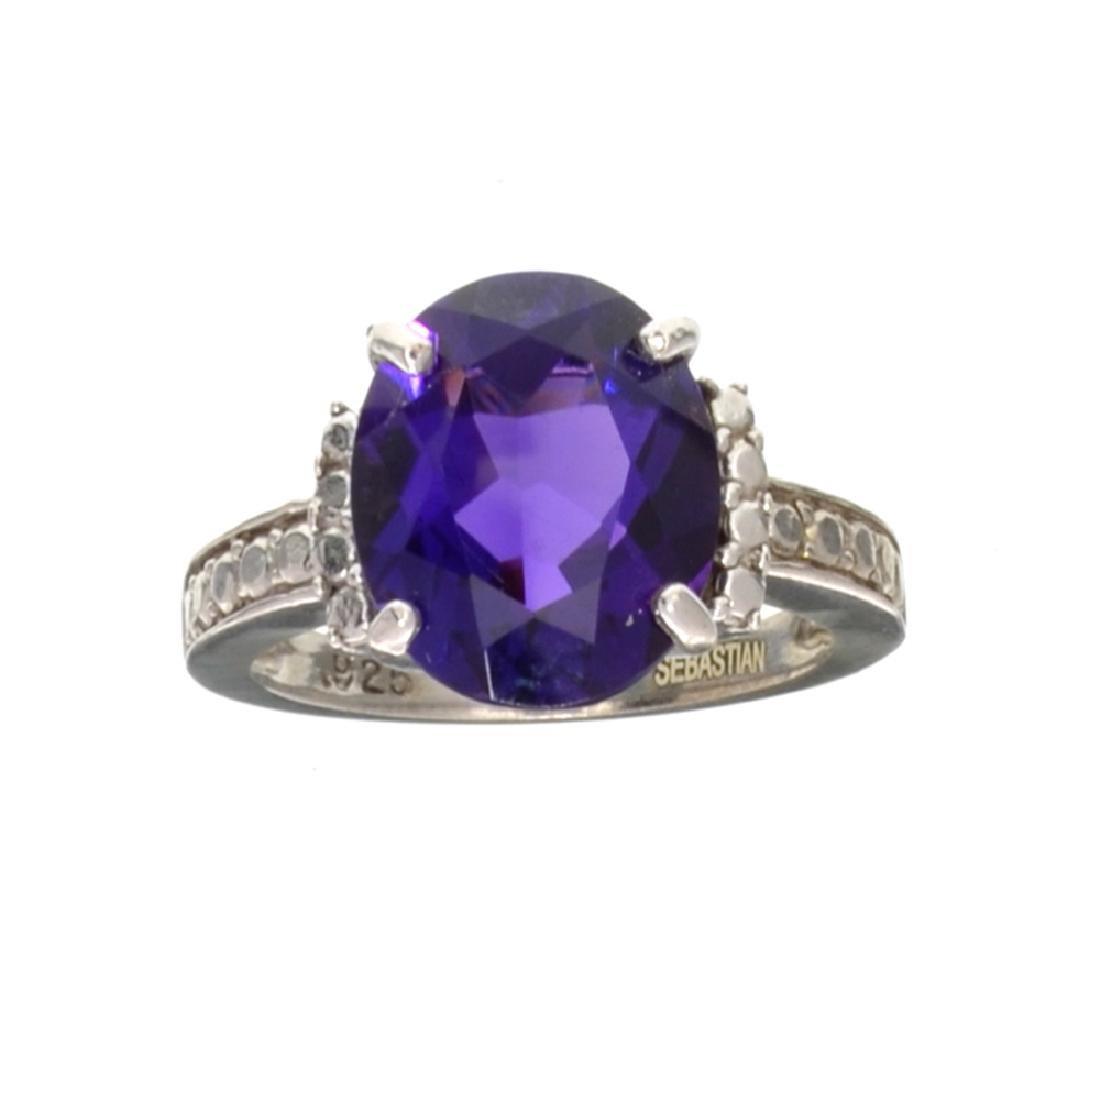 APP: 0.5k Fine Jewelry Designer Sebastian 4.05CT Oval